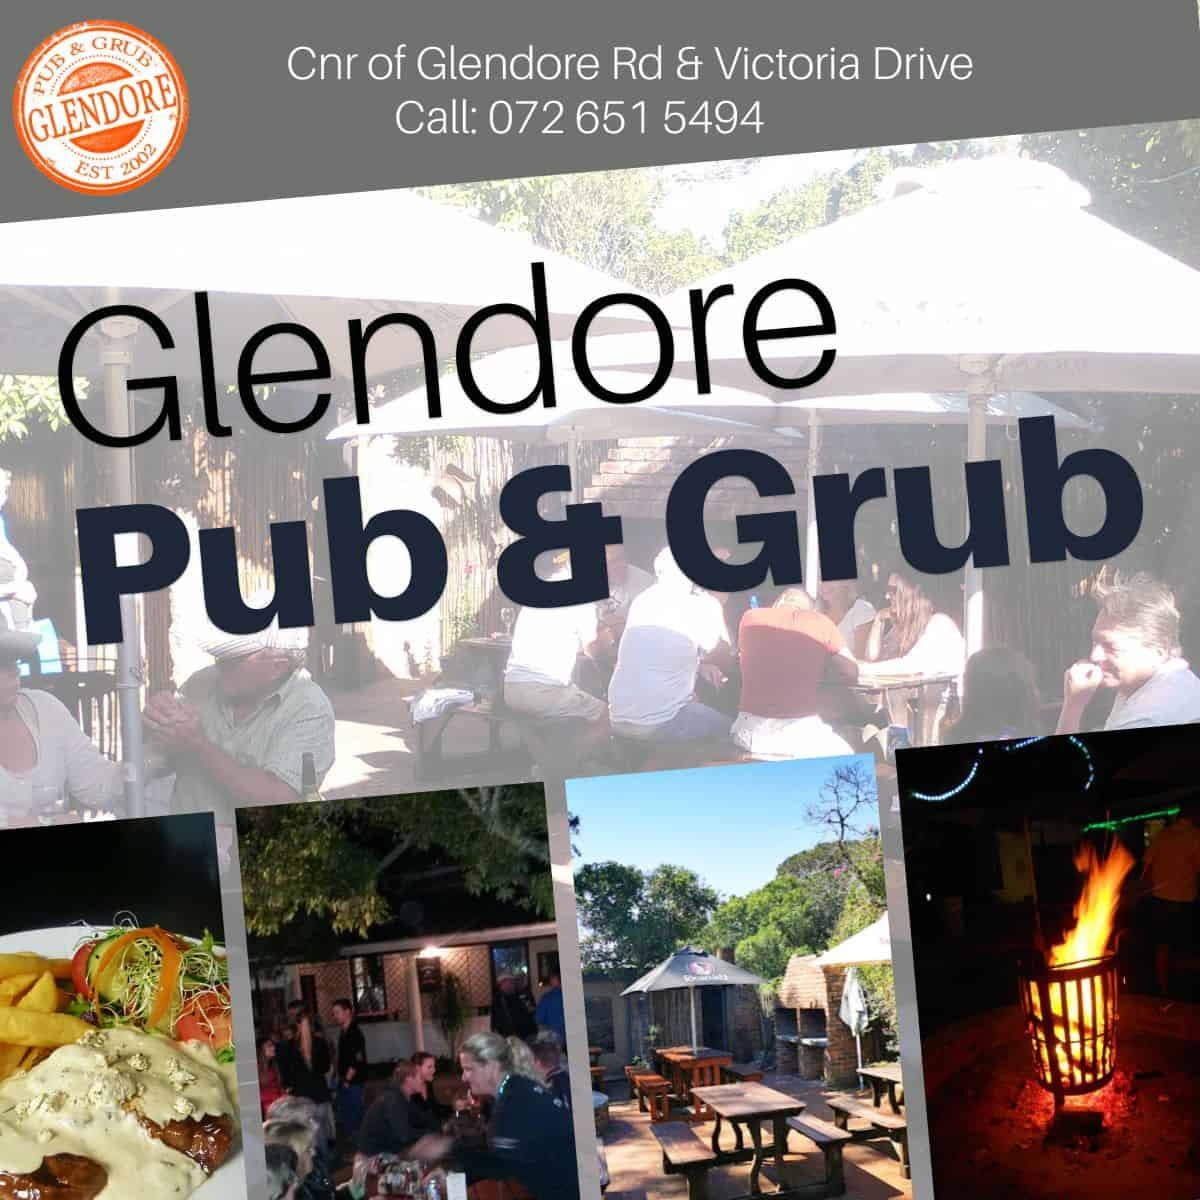 Glendore-1200×1200-layout1306-1g7r51d